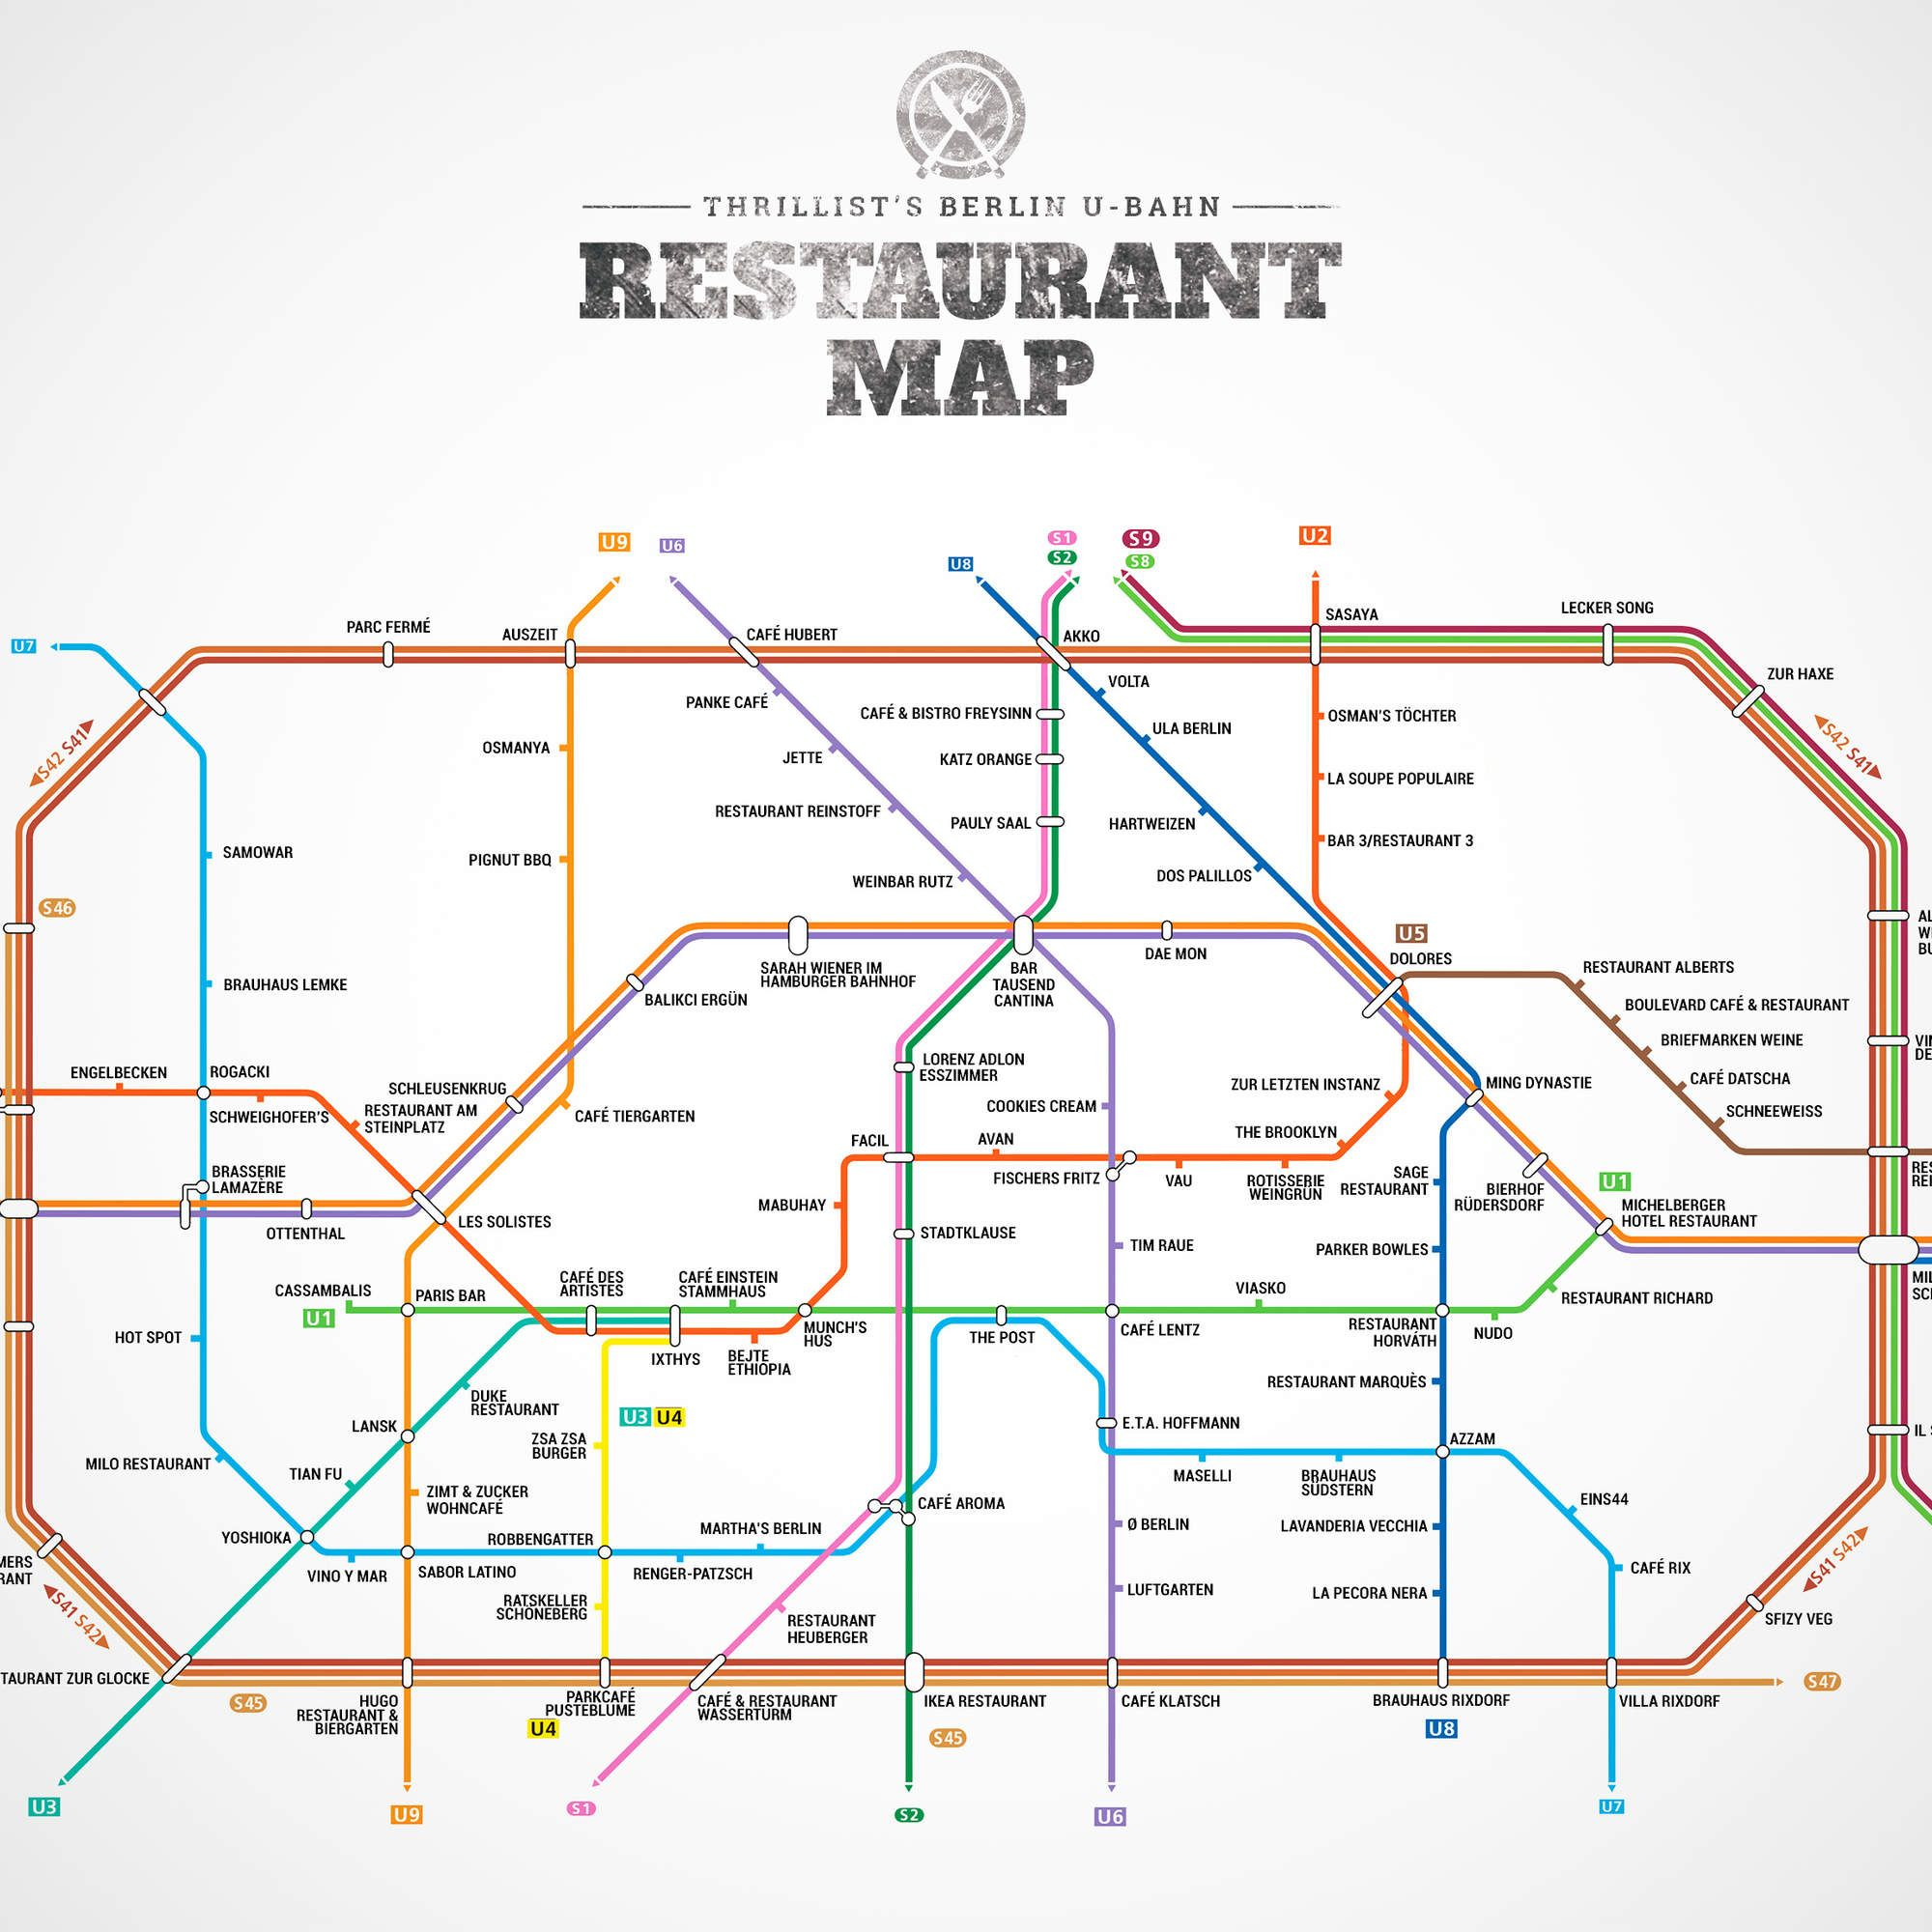 Berlin S First Ever U Bahn Restaurant Map Berlin Berlin Sights Berlin Travel